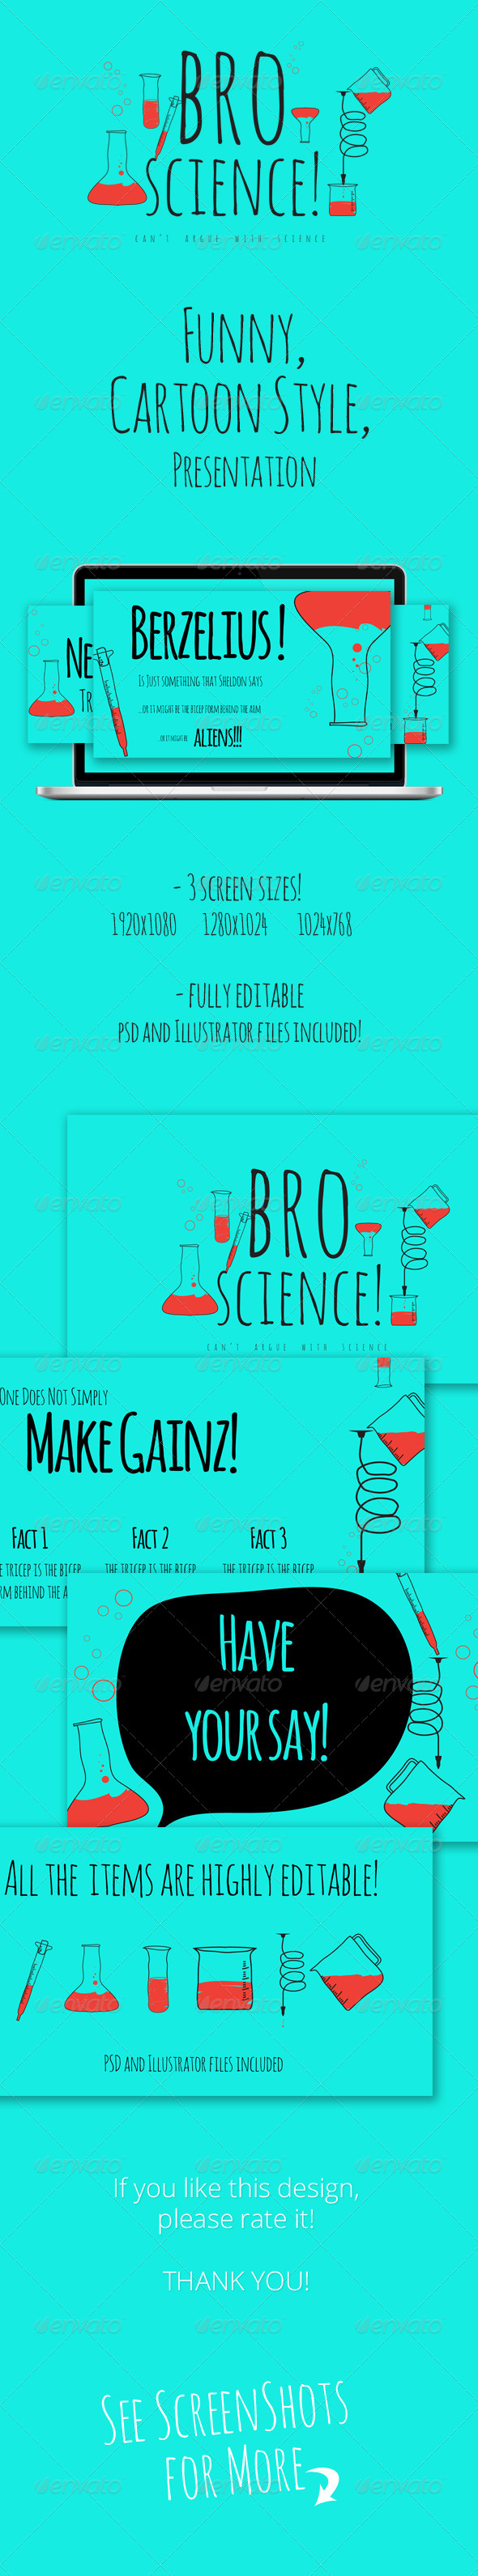 GraphicRiver Bro Science Cartoon Style Presentation 5025328